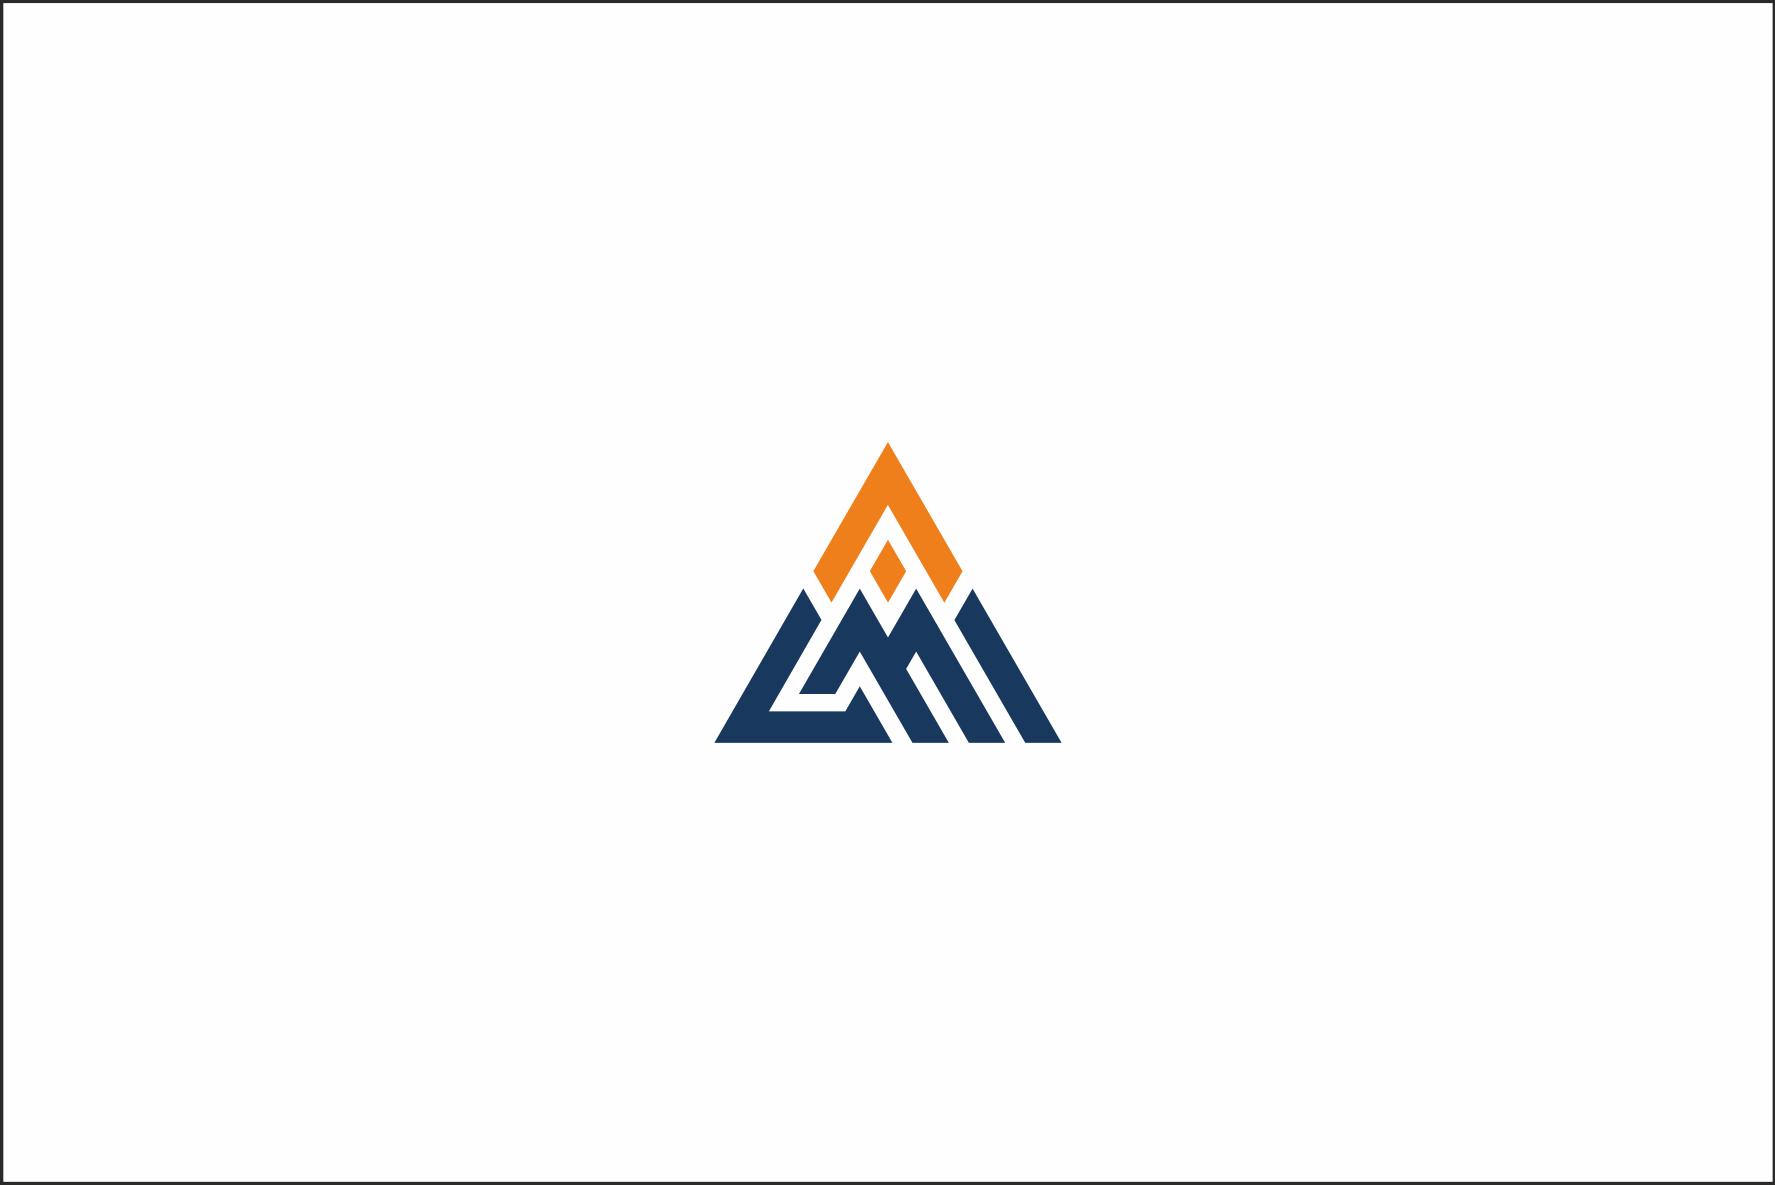 Разработка логотипа и фона фото f_0485994066e69a33.png